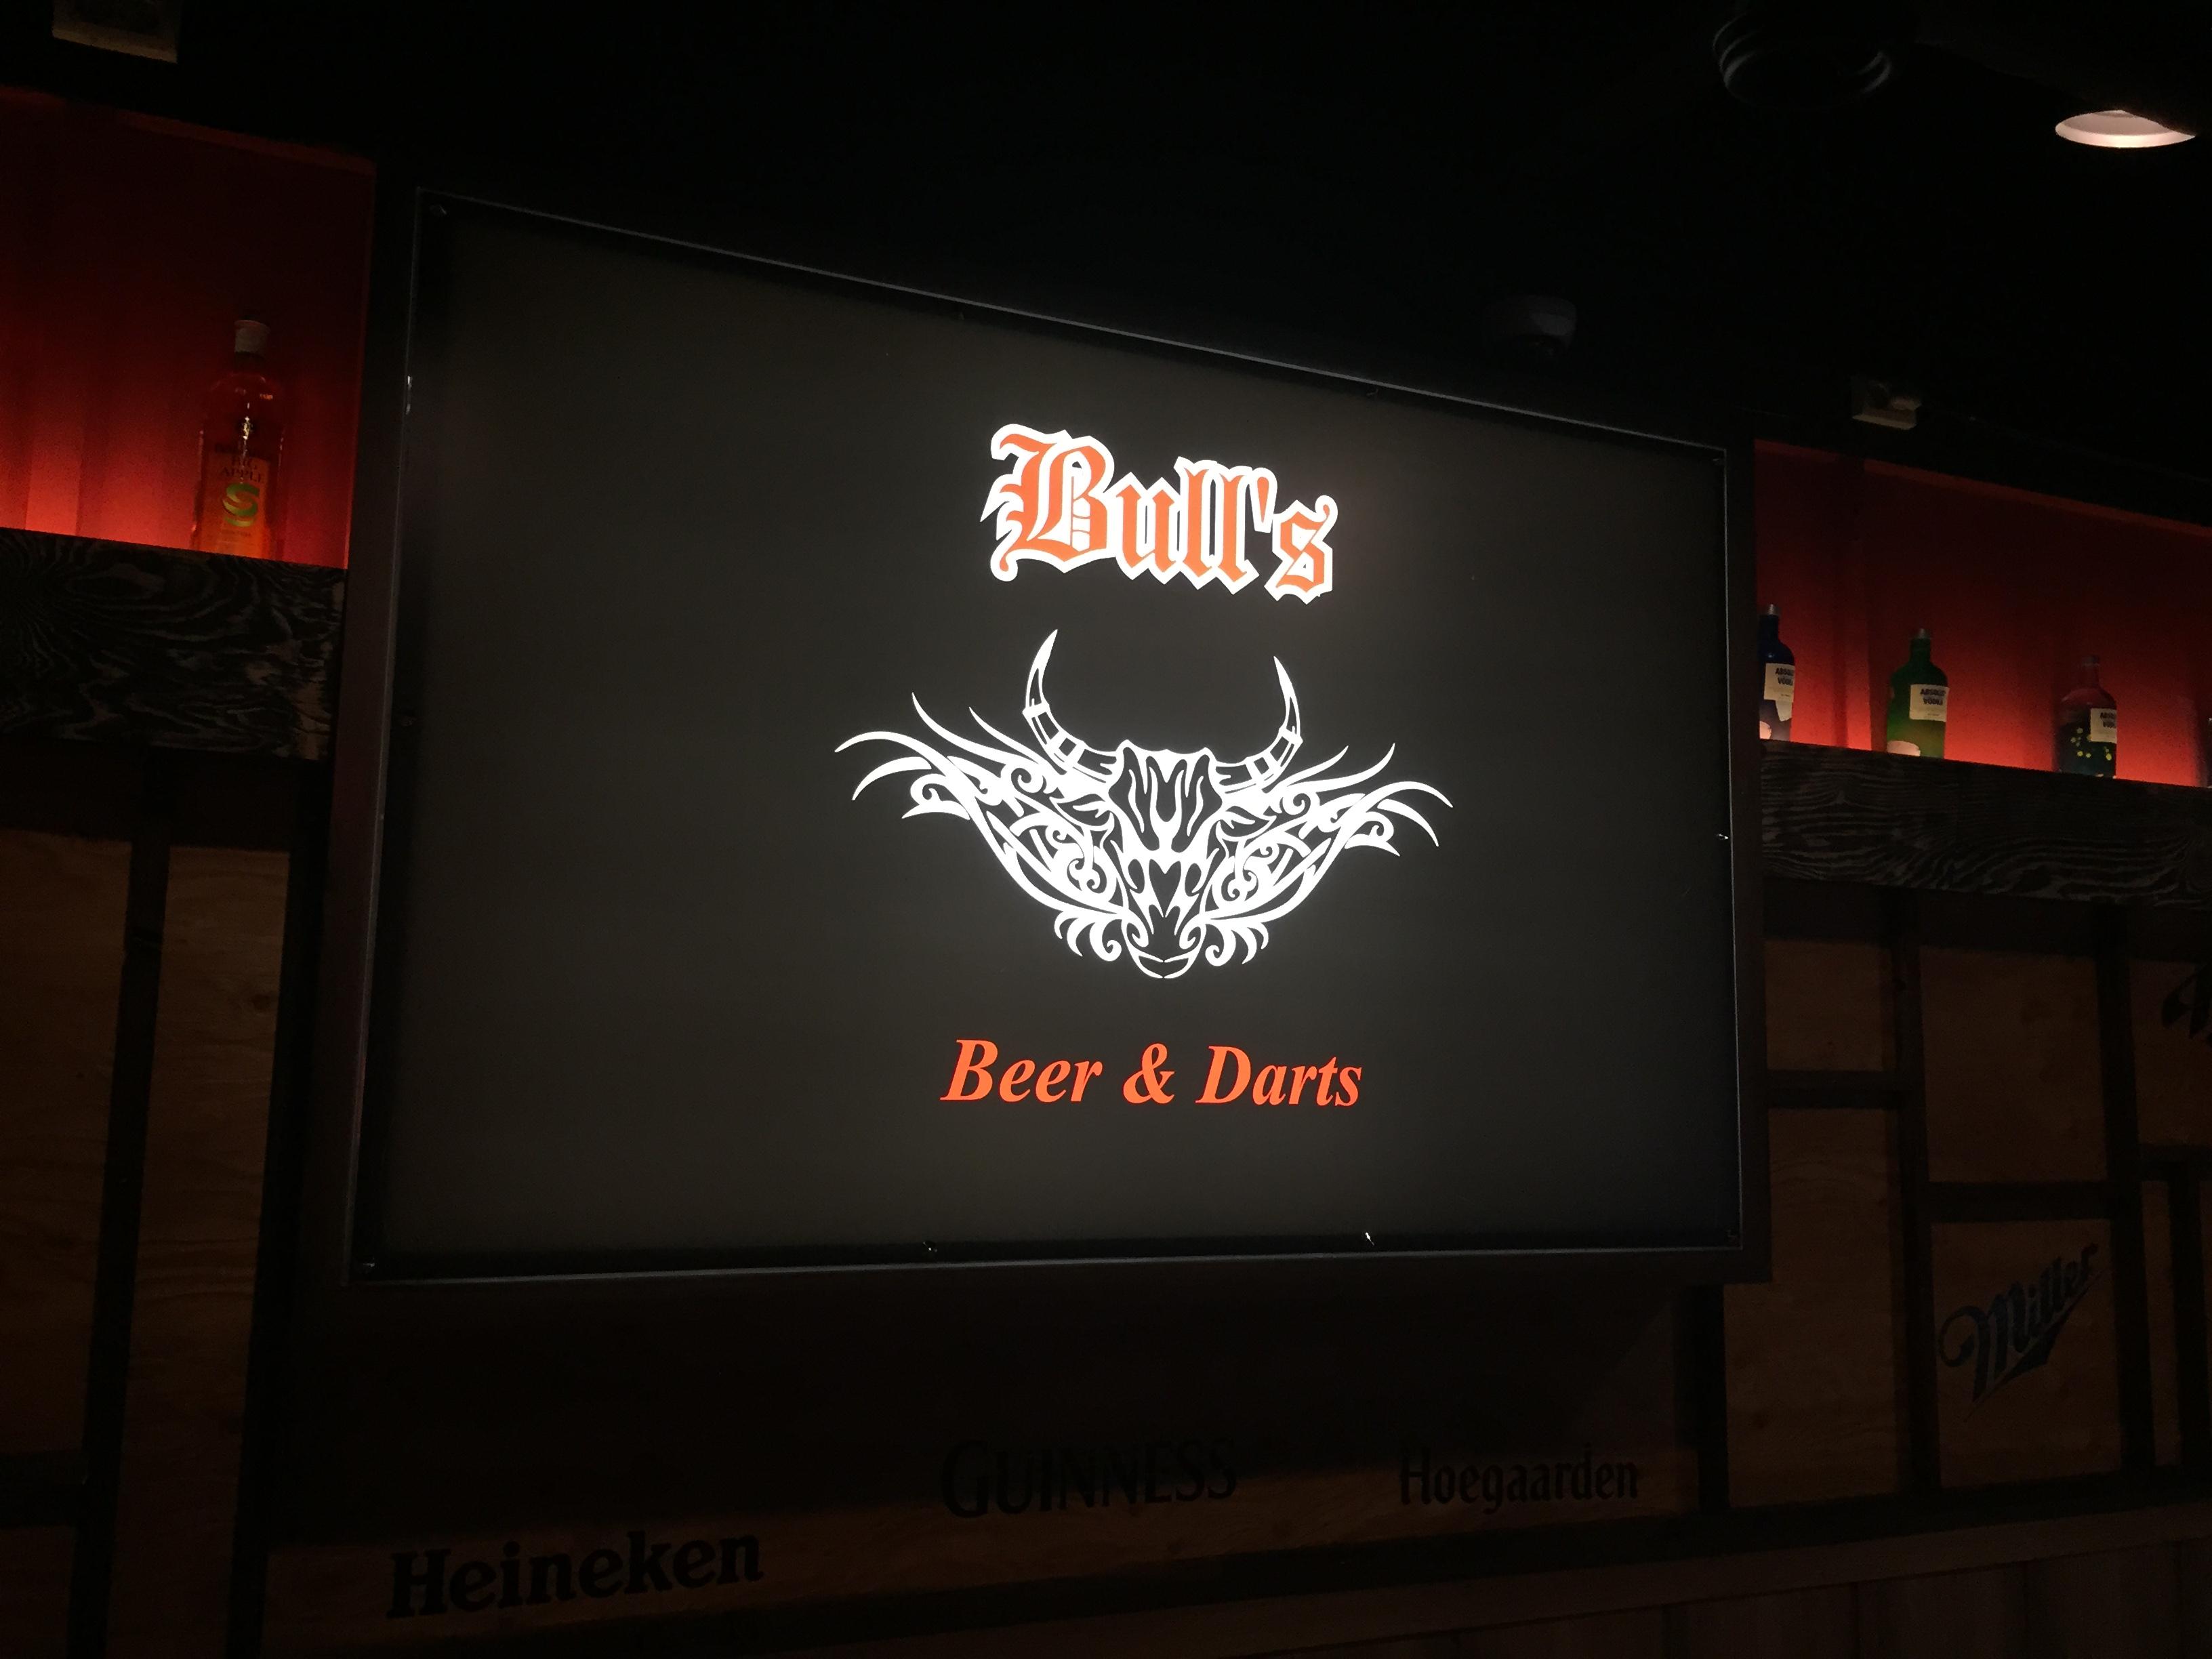 9th Bull's